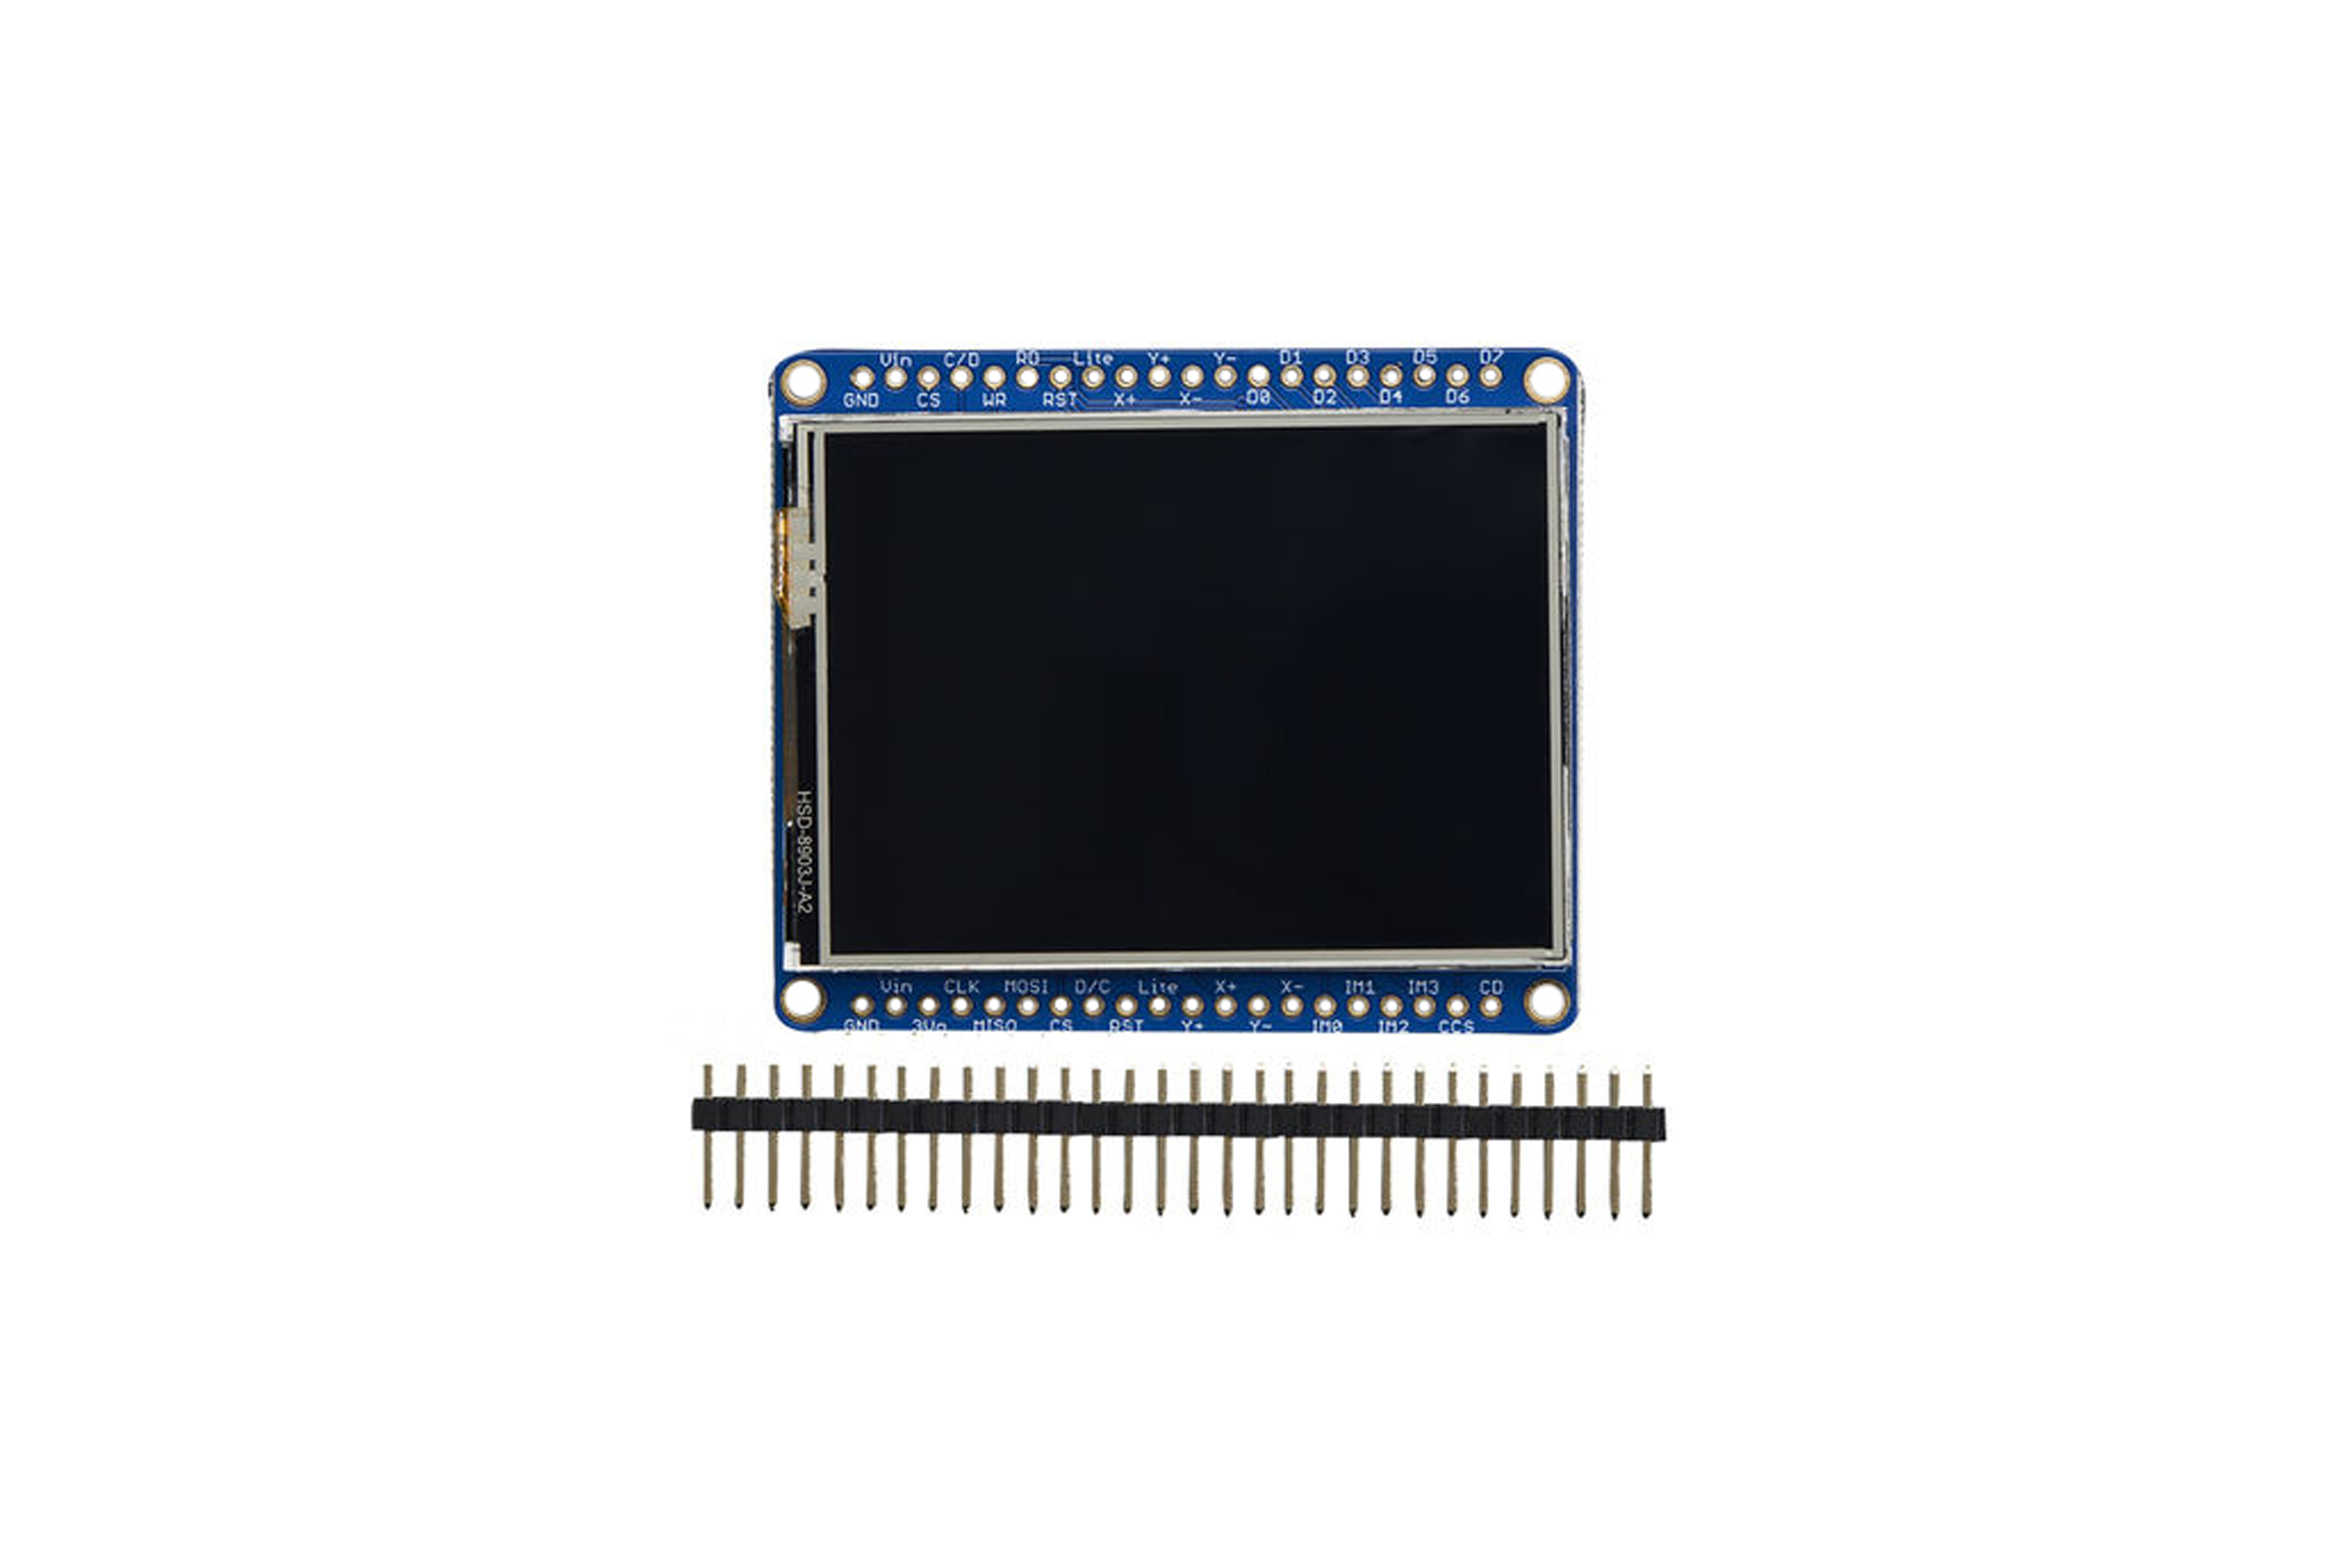 ADAFRUIT 2,4 ZOLL LCD-TOUCHSCREEN-PLATINE